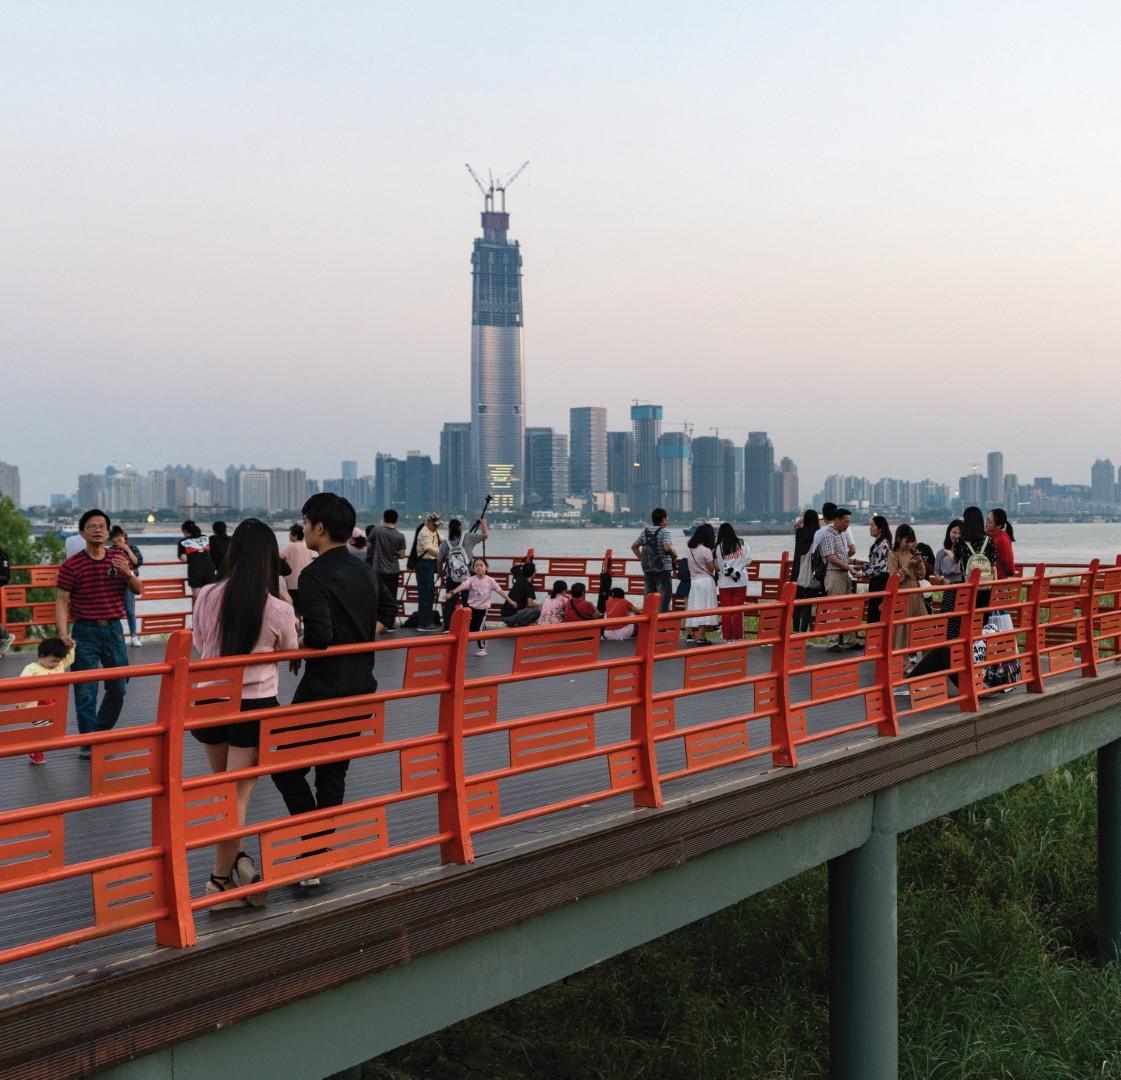 Towering High - New Skyscrapers